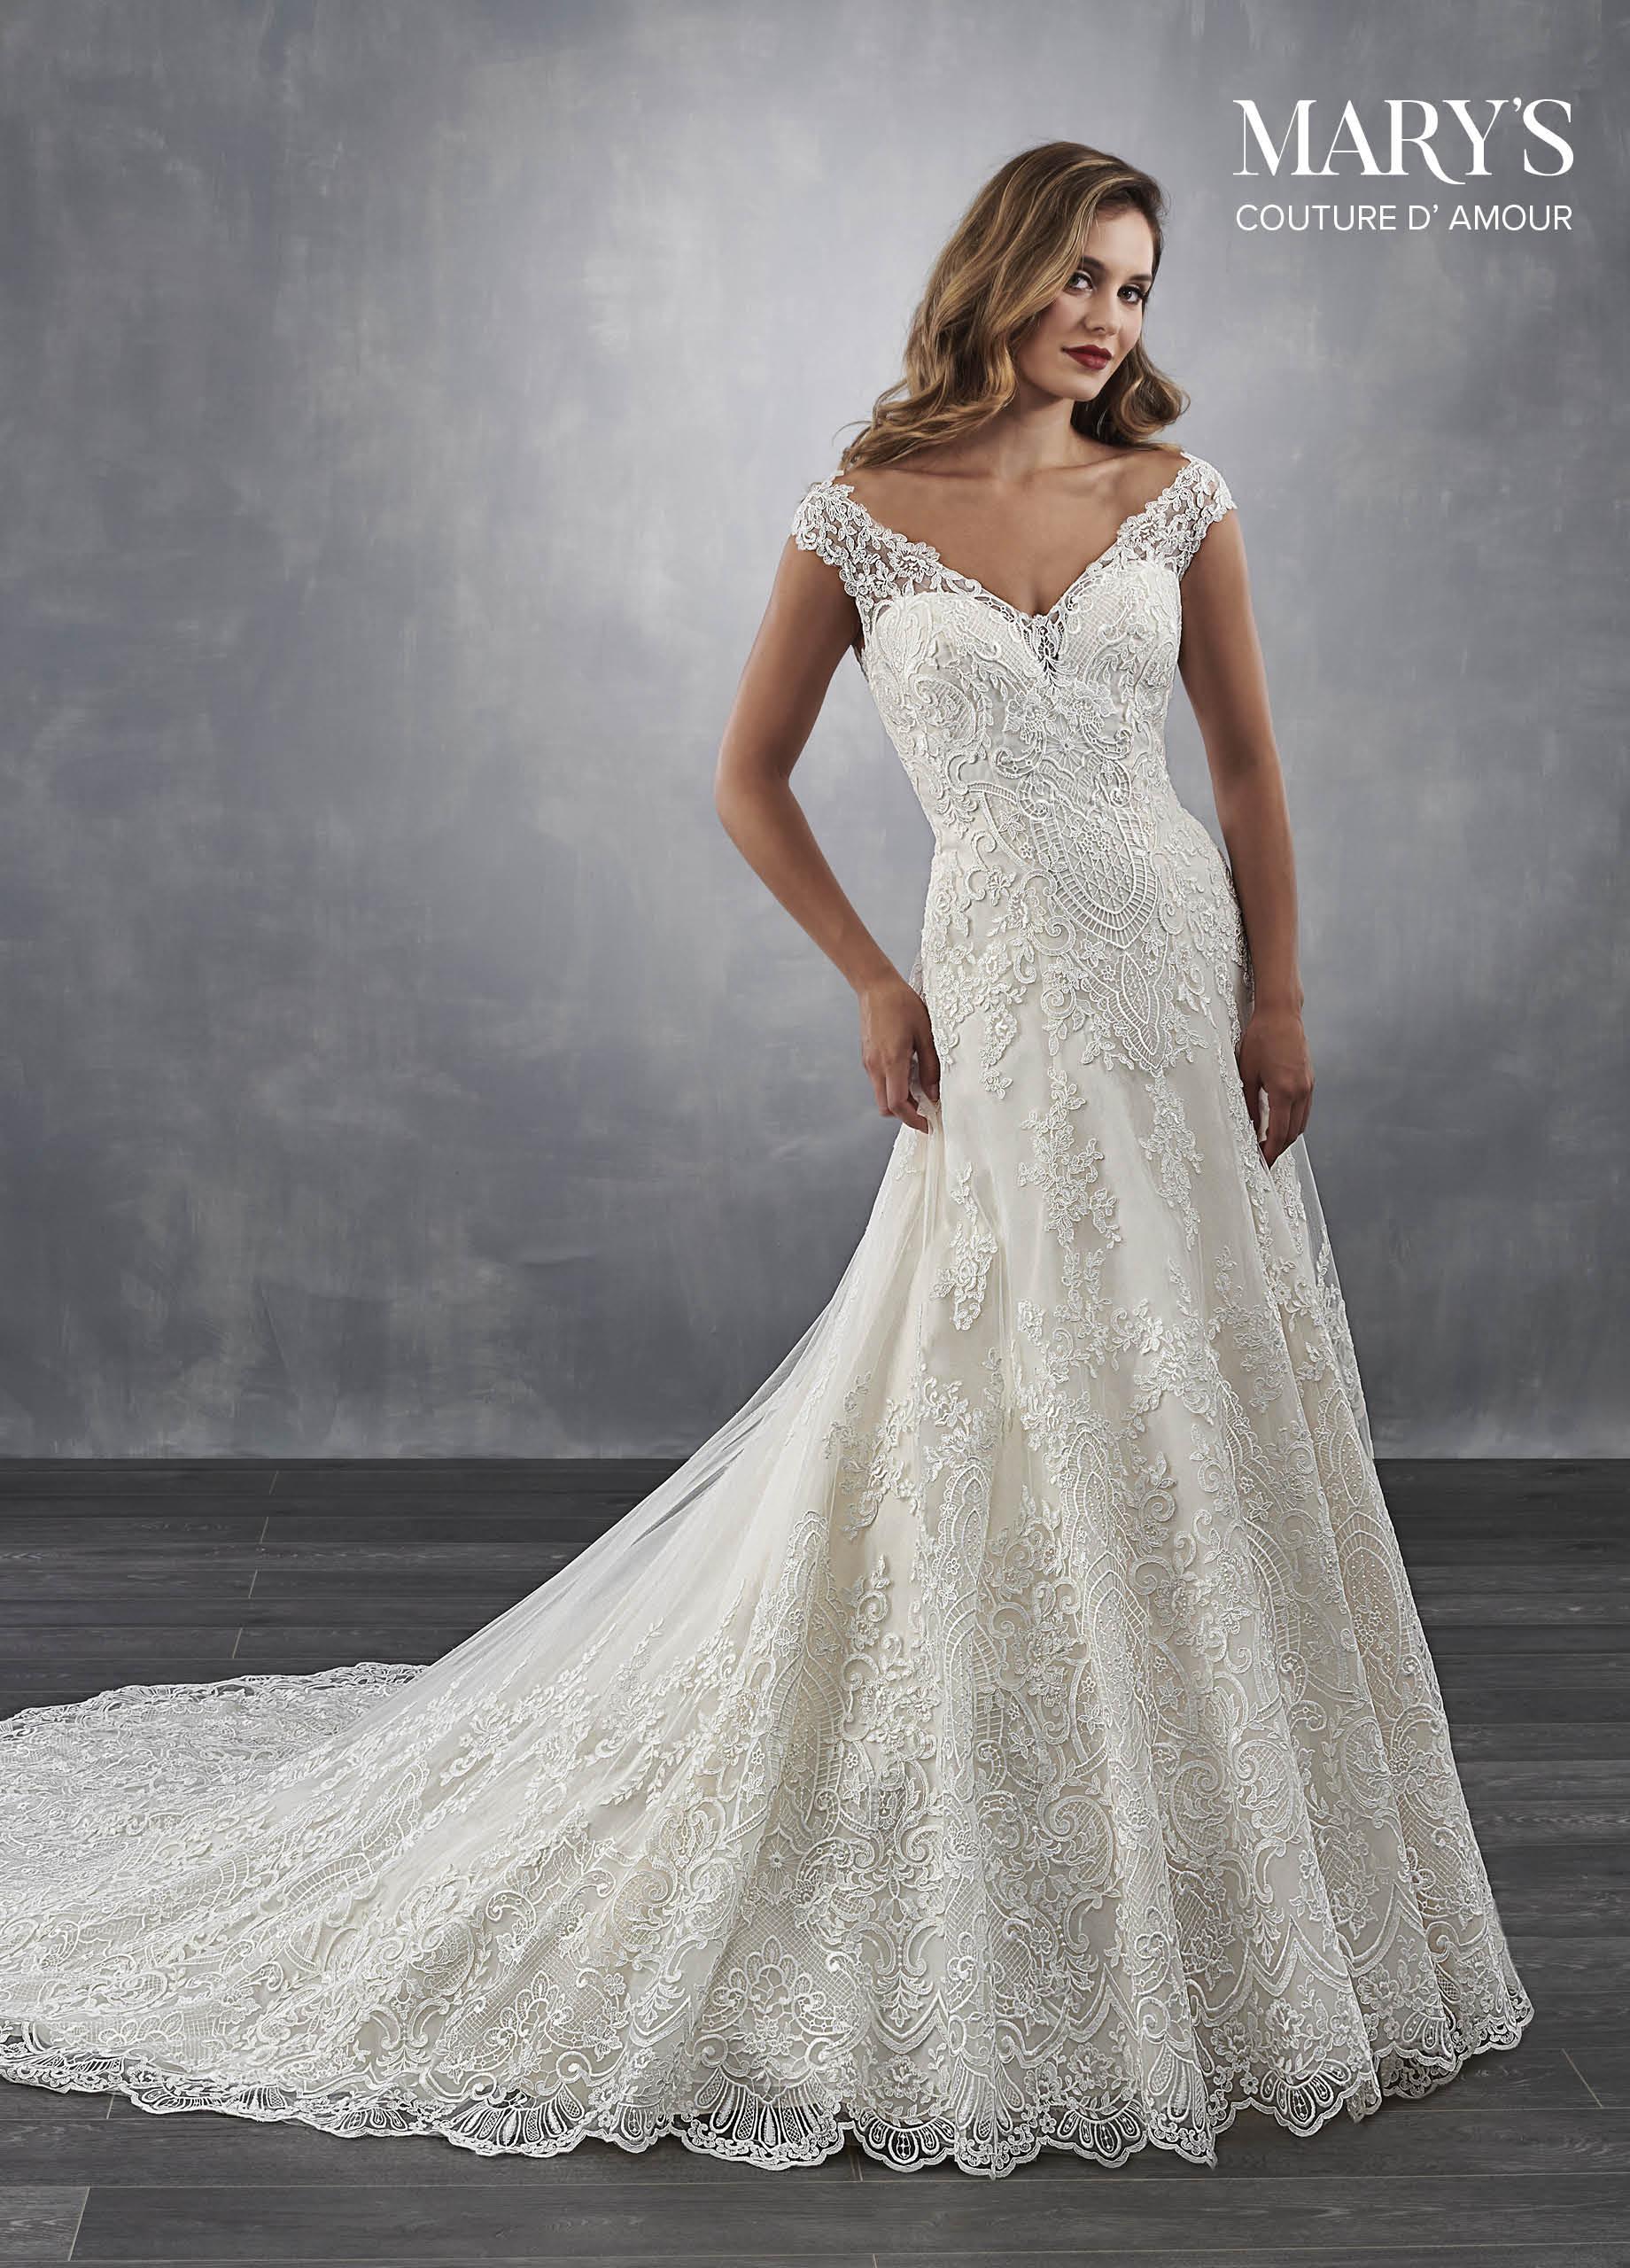 b5a670d7322 Couture Damour Bridal Dresses